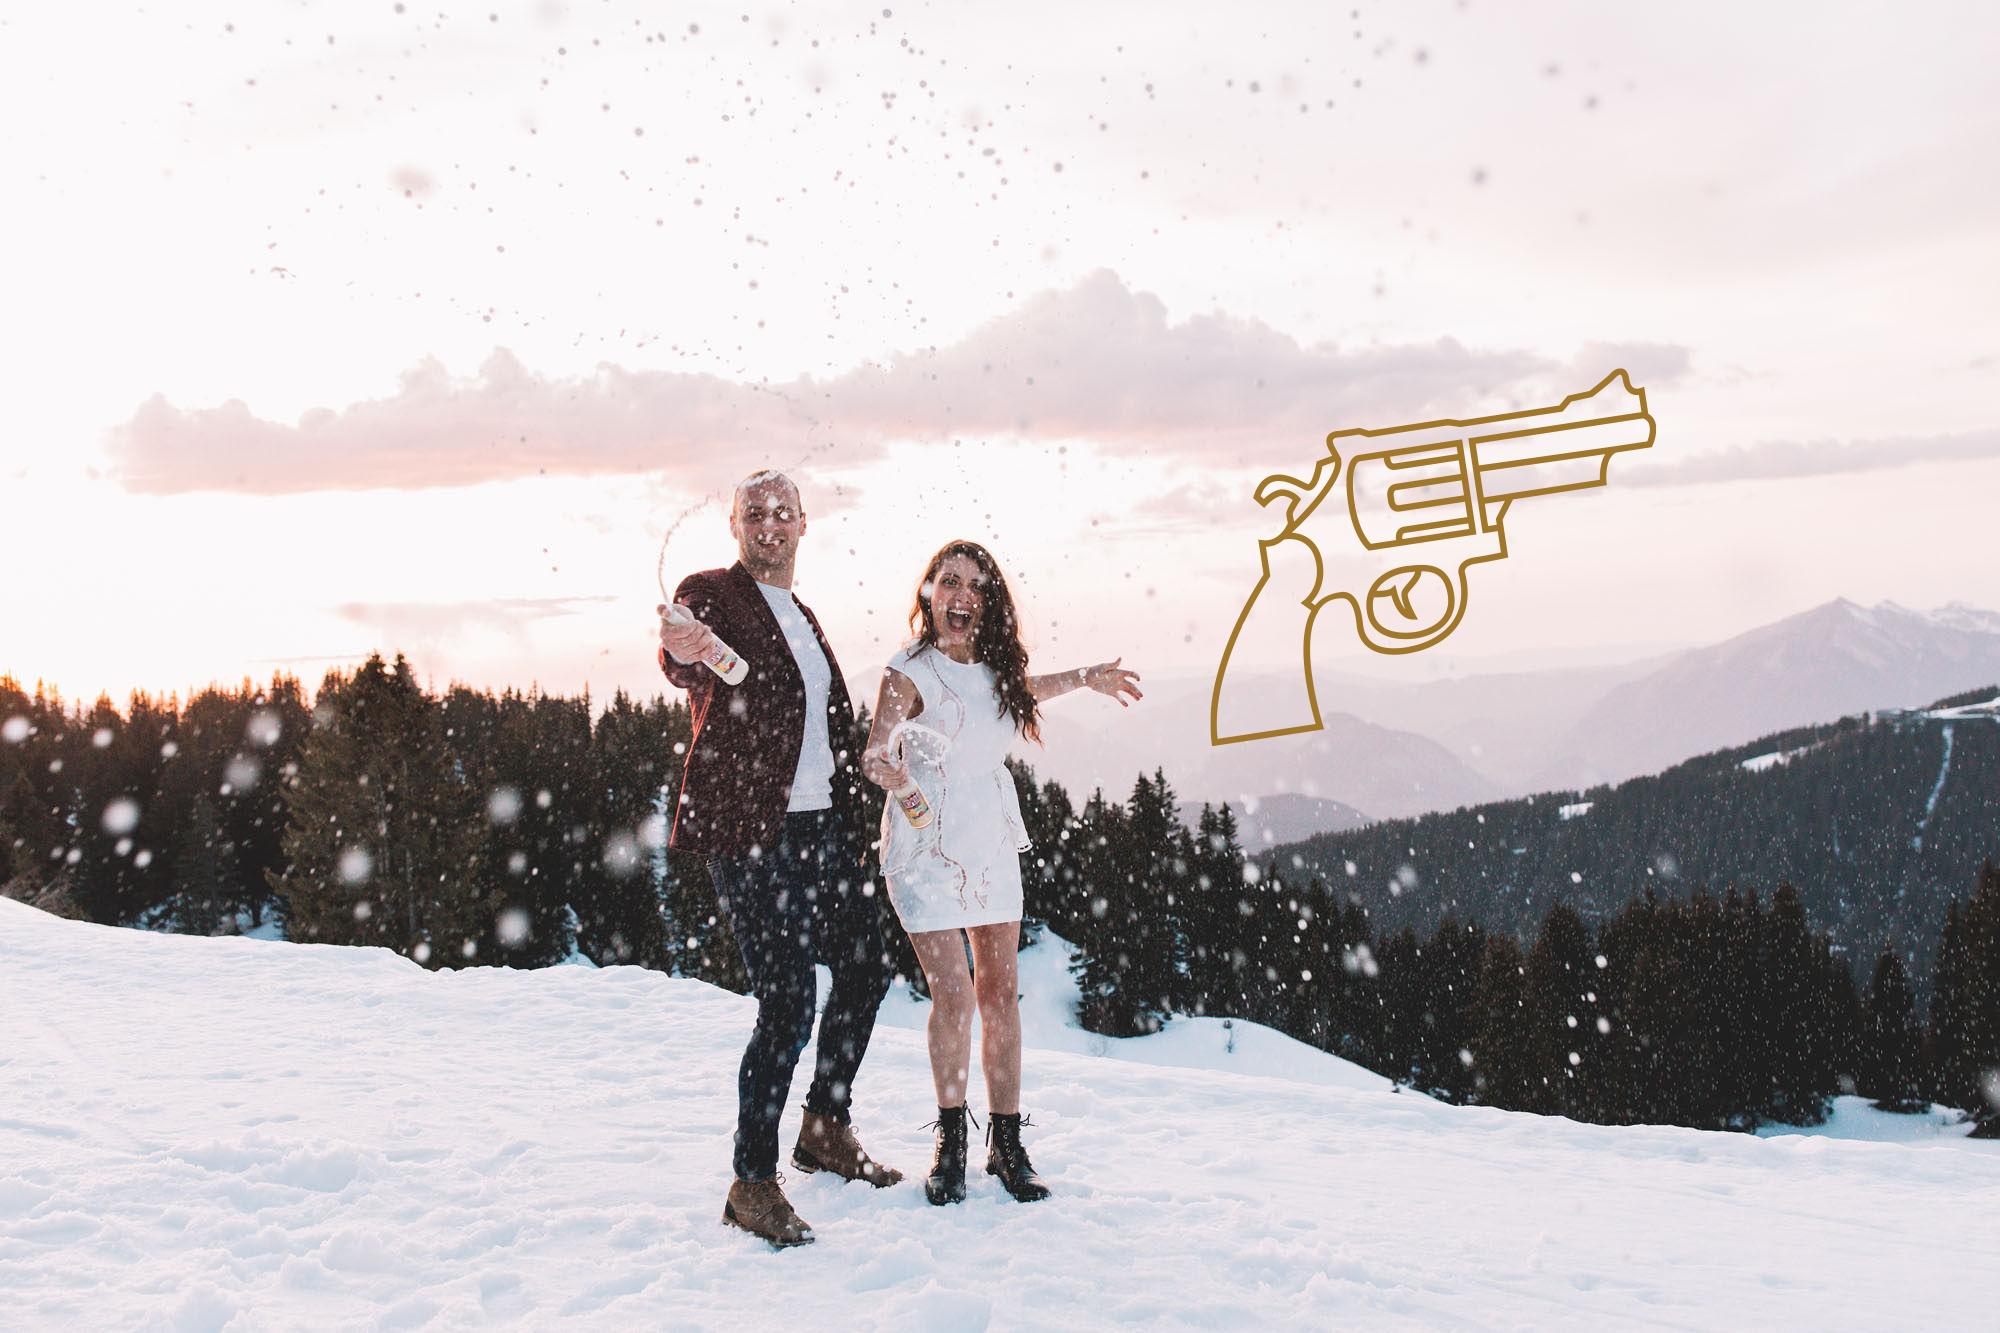 GUNN_NOEMIE+VIANNEY_ALPEES_PHOTOGRAPHE_MARIAGE_LES BANDITS-07